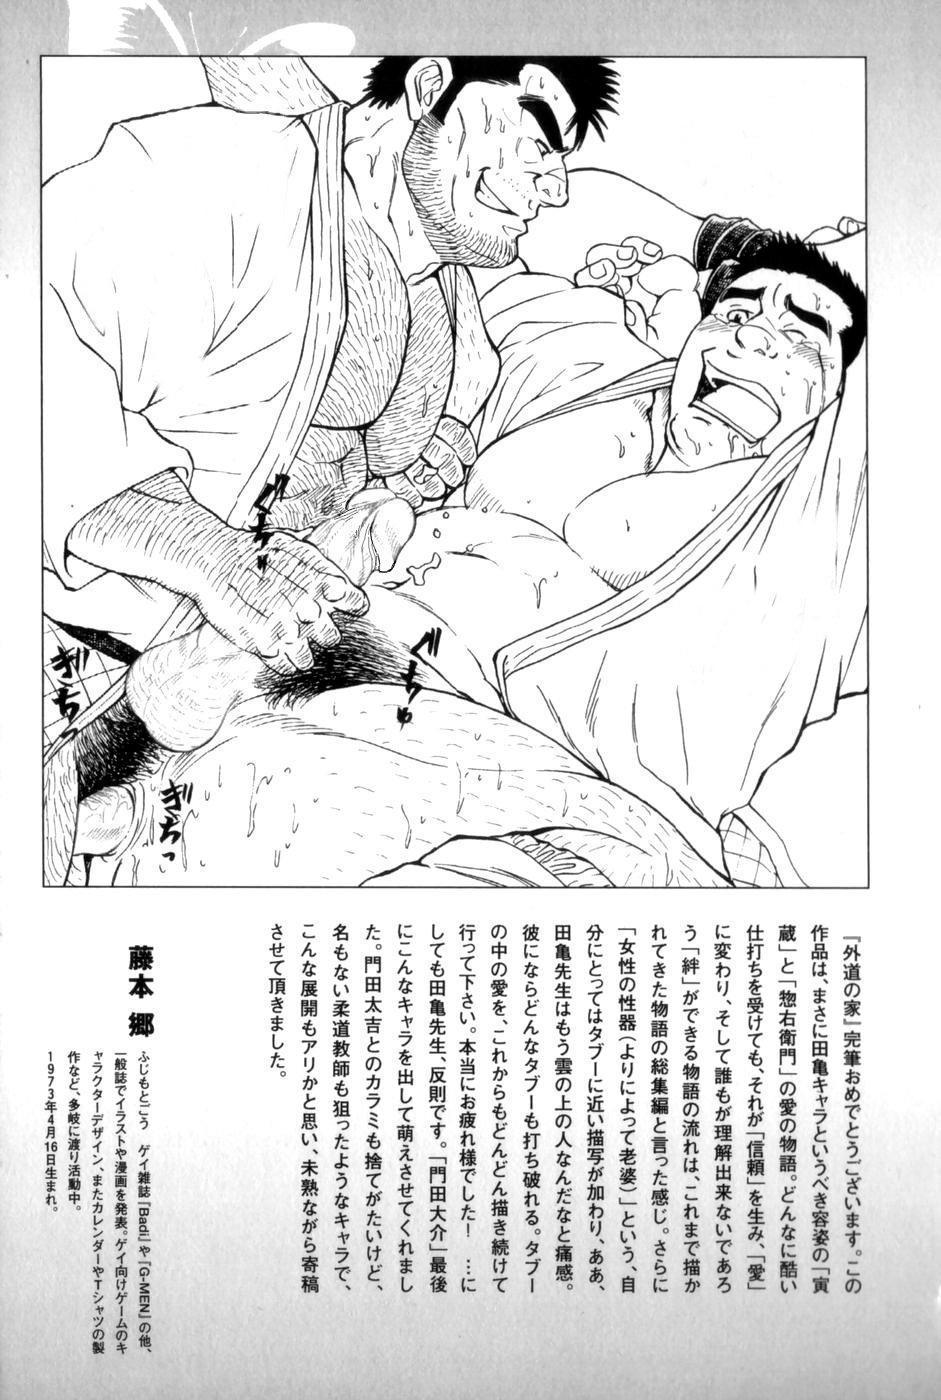 Gedou no Ie Gekan   House of Brutes Vol. 3 Ch. 8 36